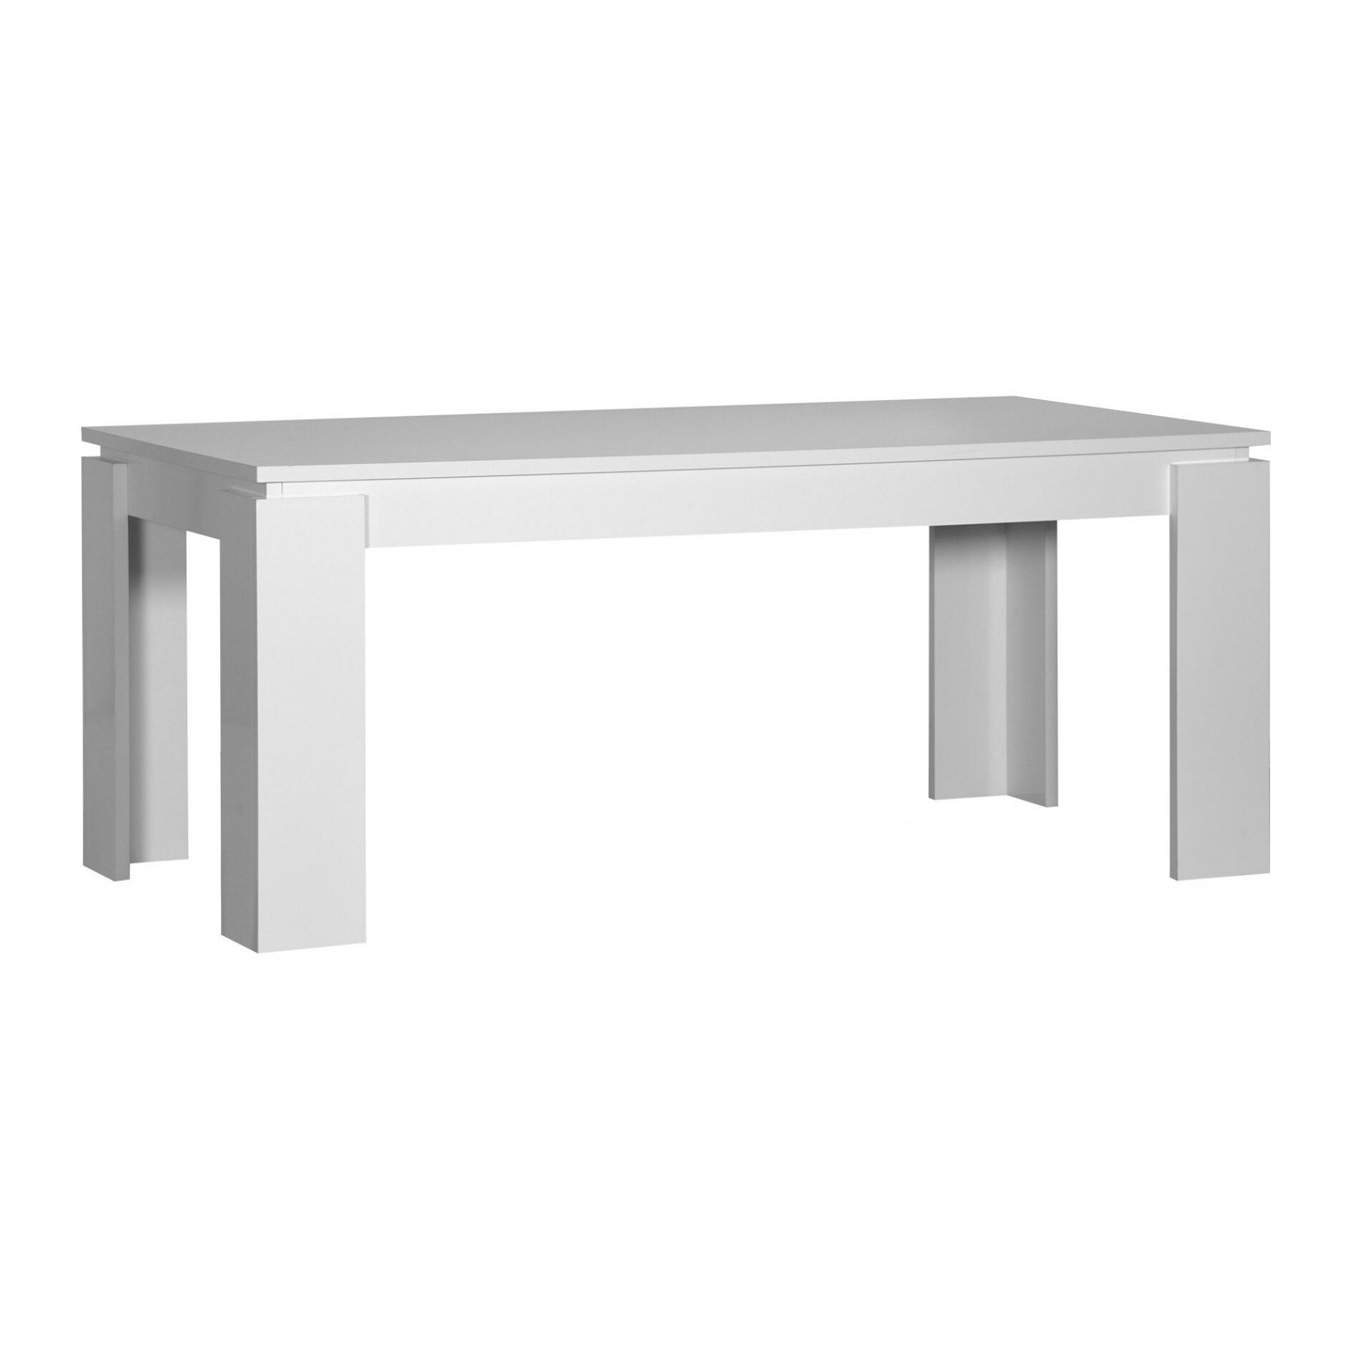 Toscana White High Gloss Coffee Table: Floyd White High Gloss Extending Dining Table